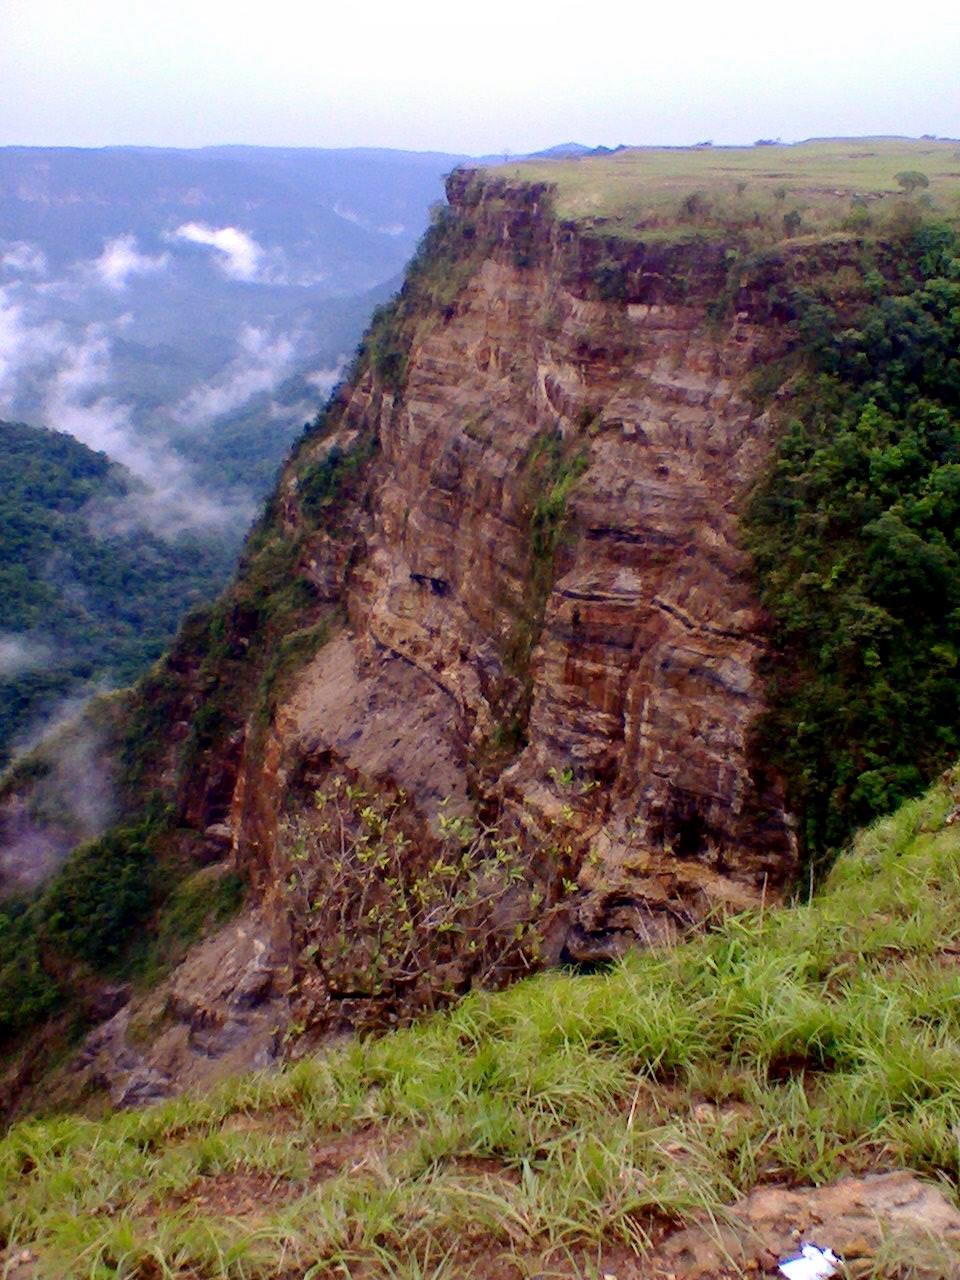 Gorge at National park